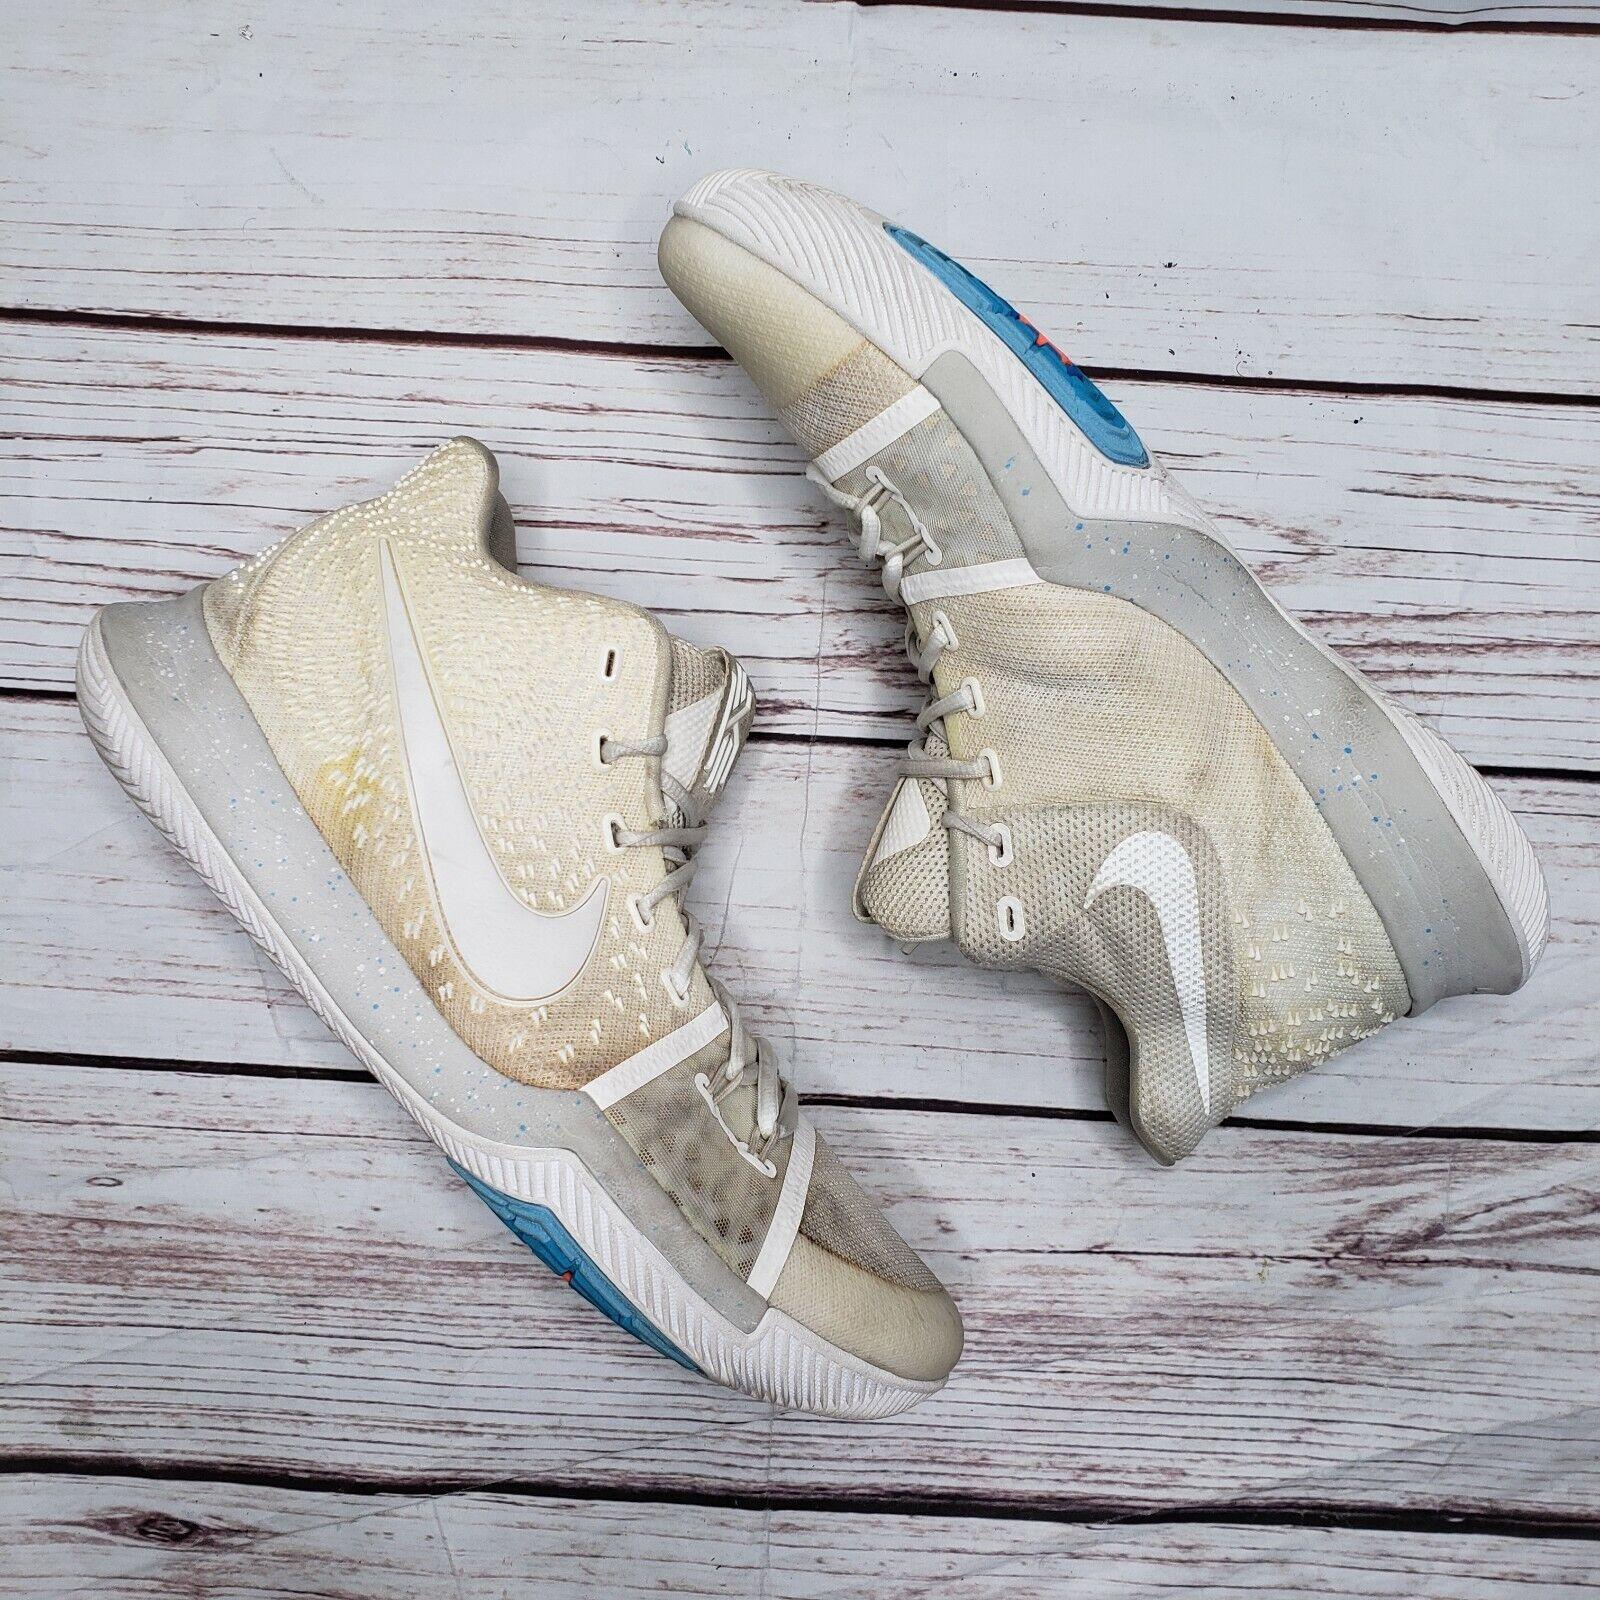 Nike Kyrie 3 Ivory Pale Grey Light Bone Summer Pack 852395-101 Sz 13 Basketball